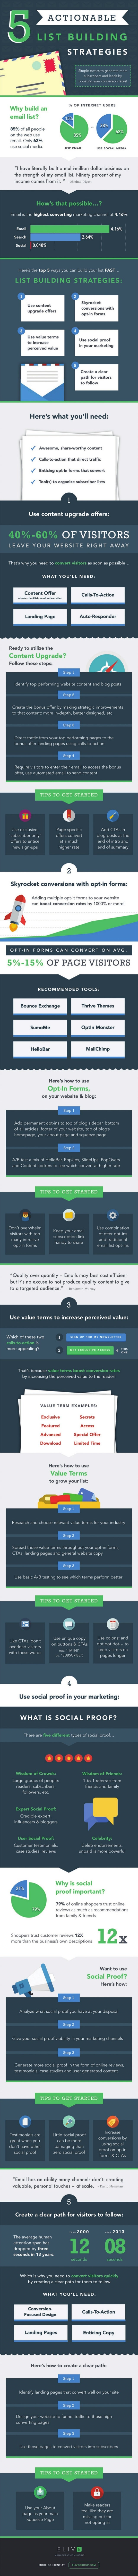 5 Actionable List Building Strategies (Infographic)